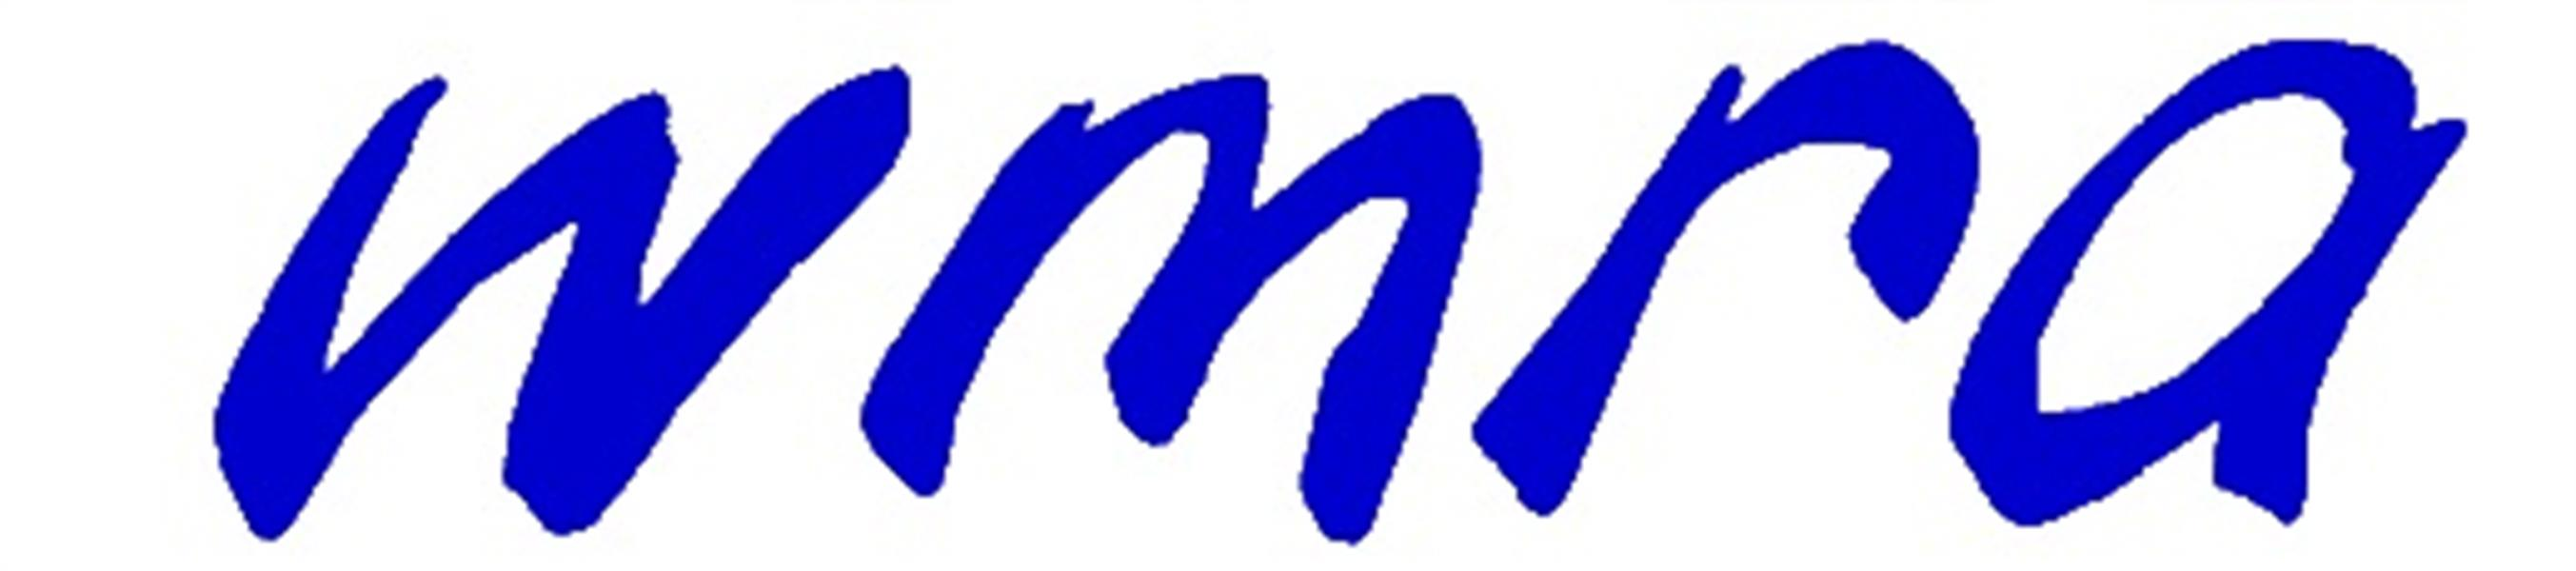 WMRA and WEMC Public Radio